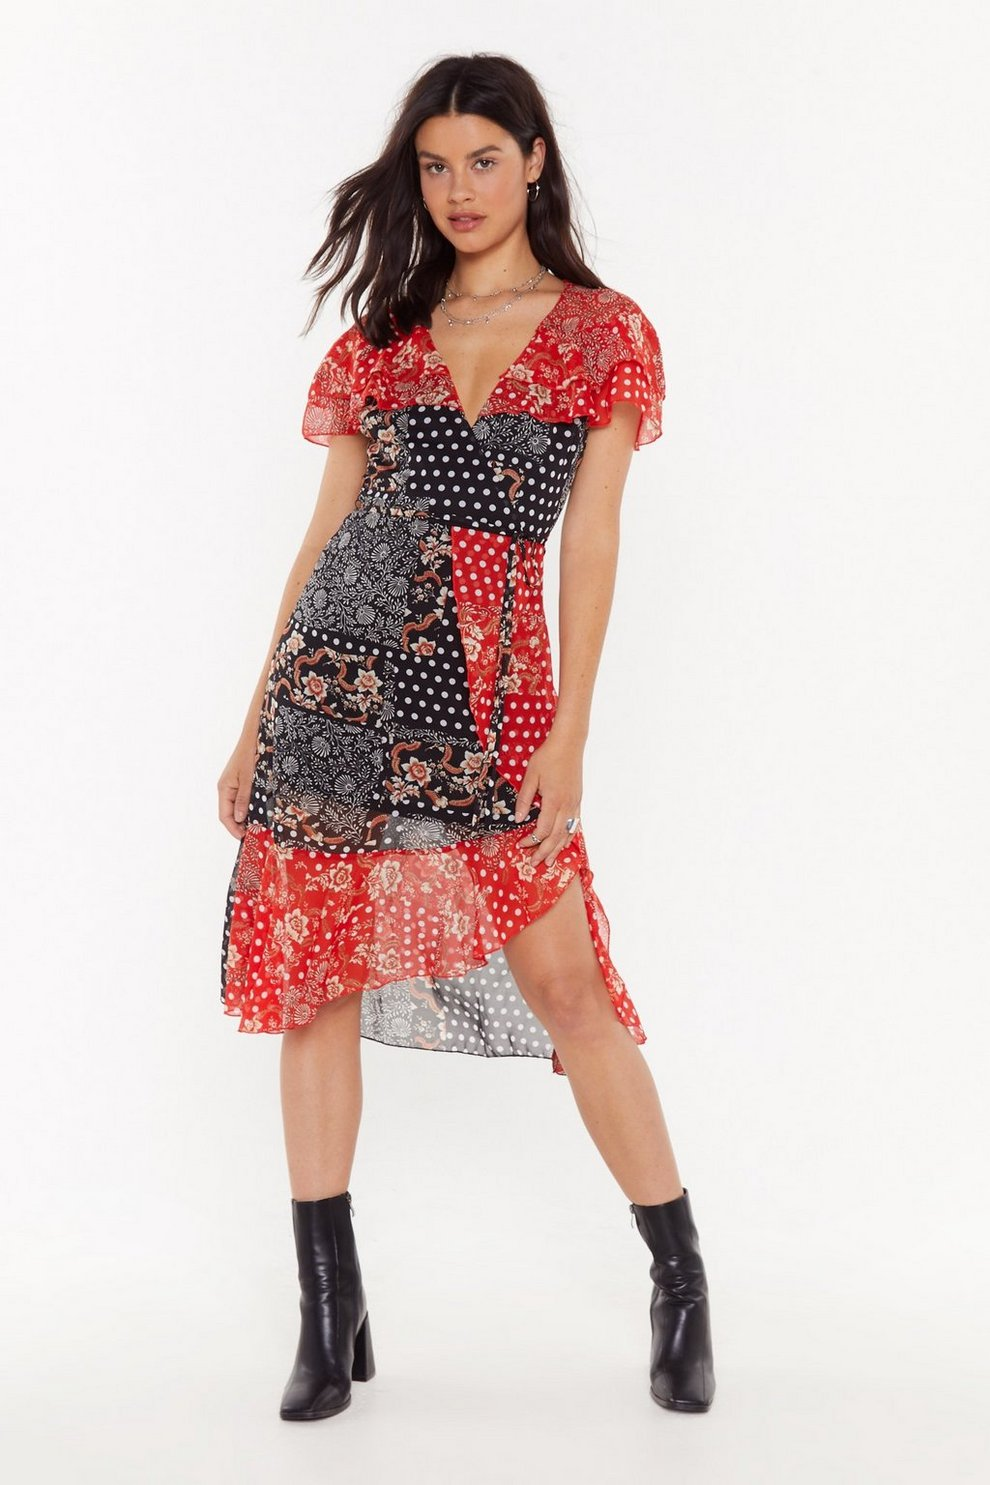 2b8174ac943b Don't Patch Feelings Mixed Print Midi Dress | Shop Clothes at Nasty Gal!